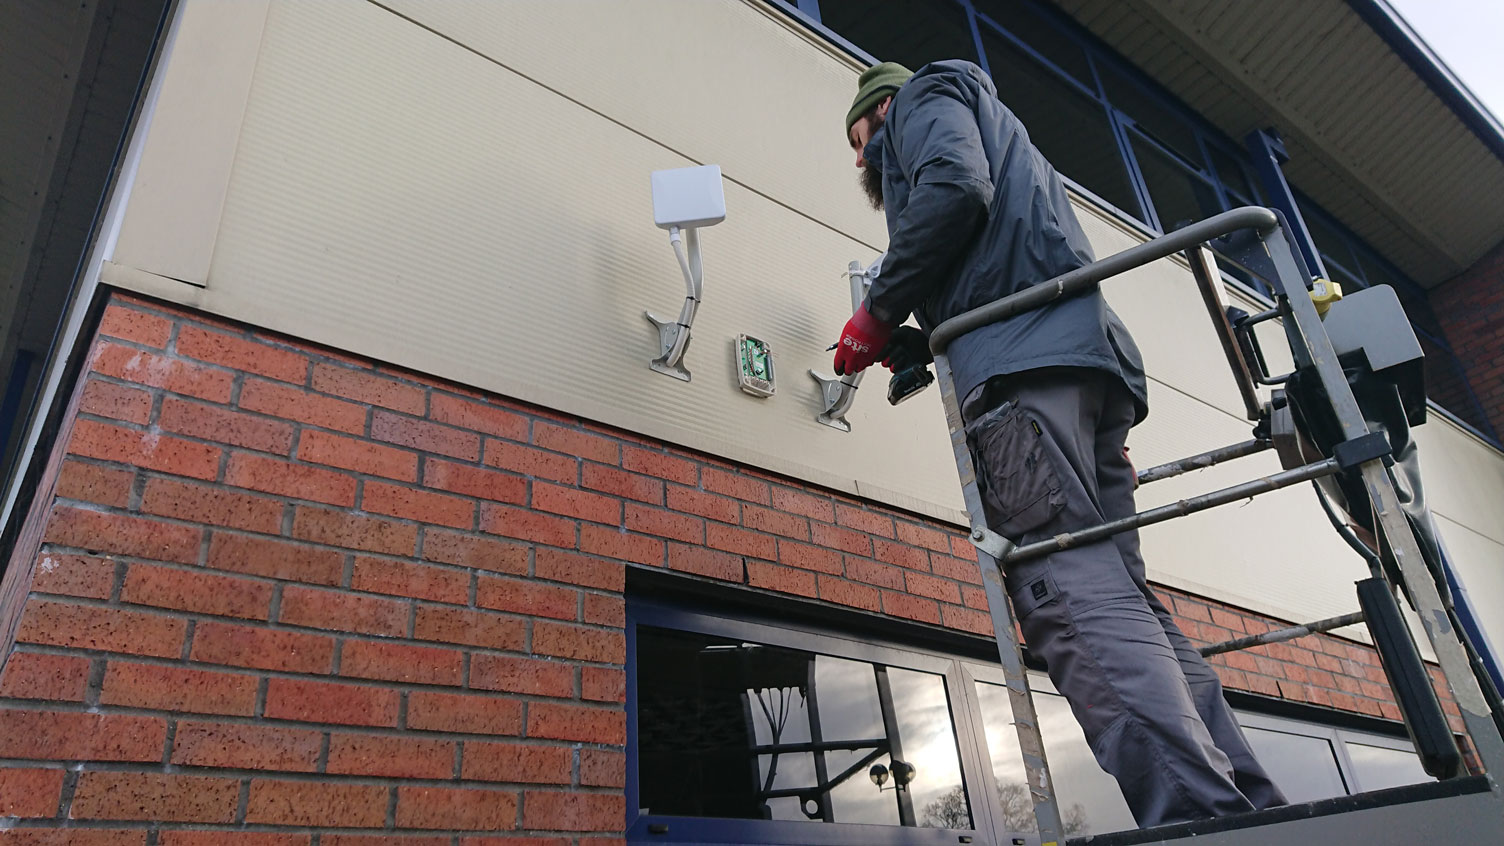 Commercial-CCTV-Installation-Swindon.jpg